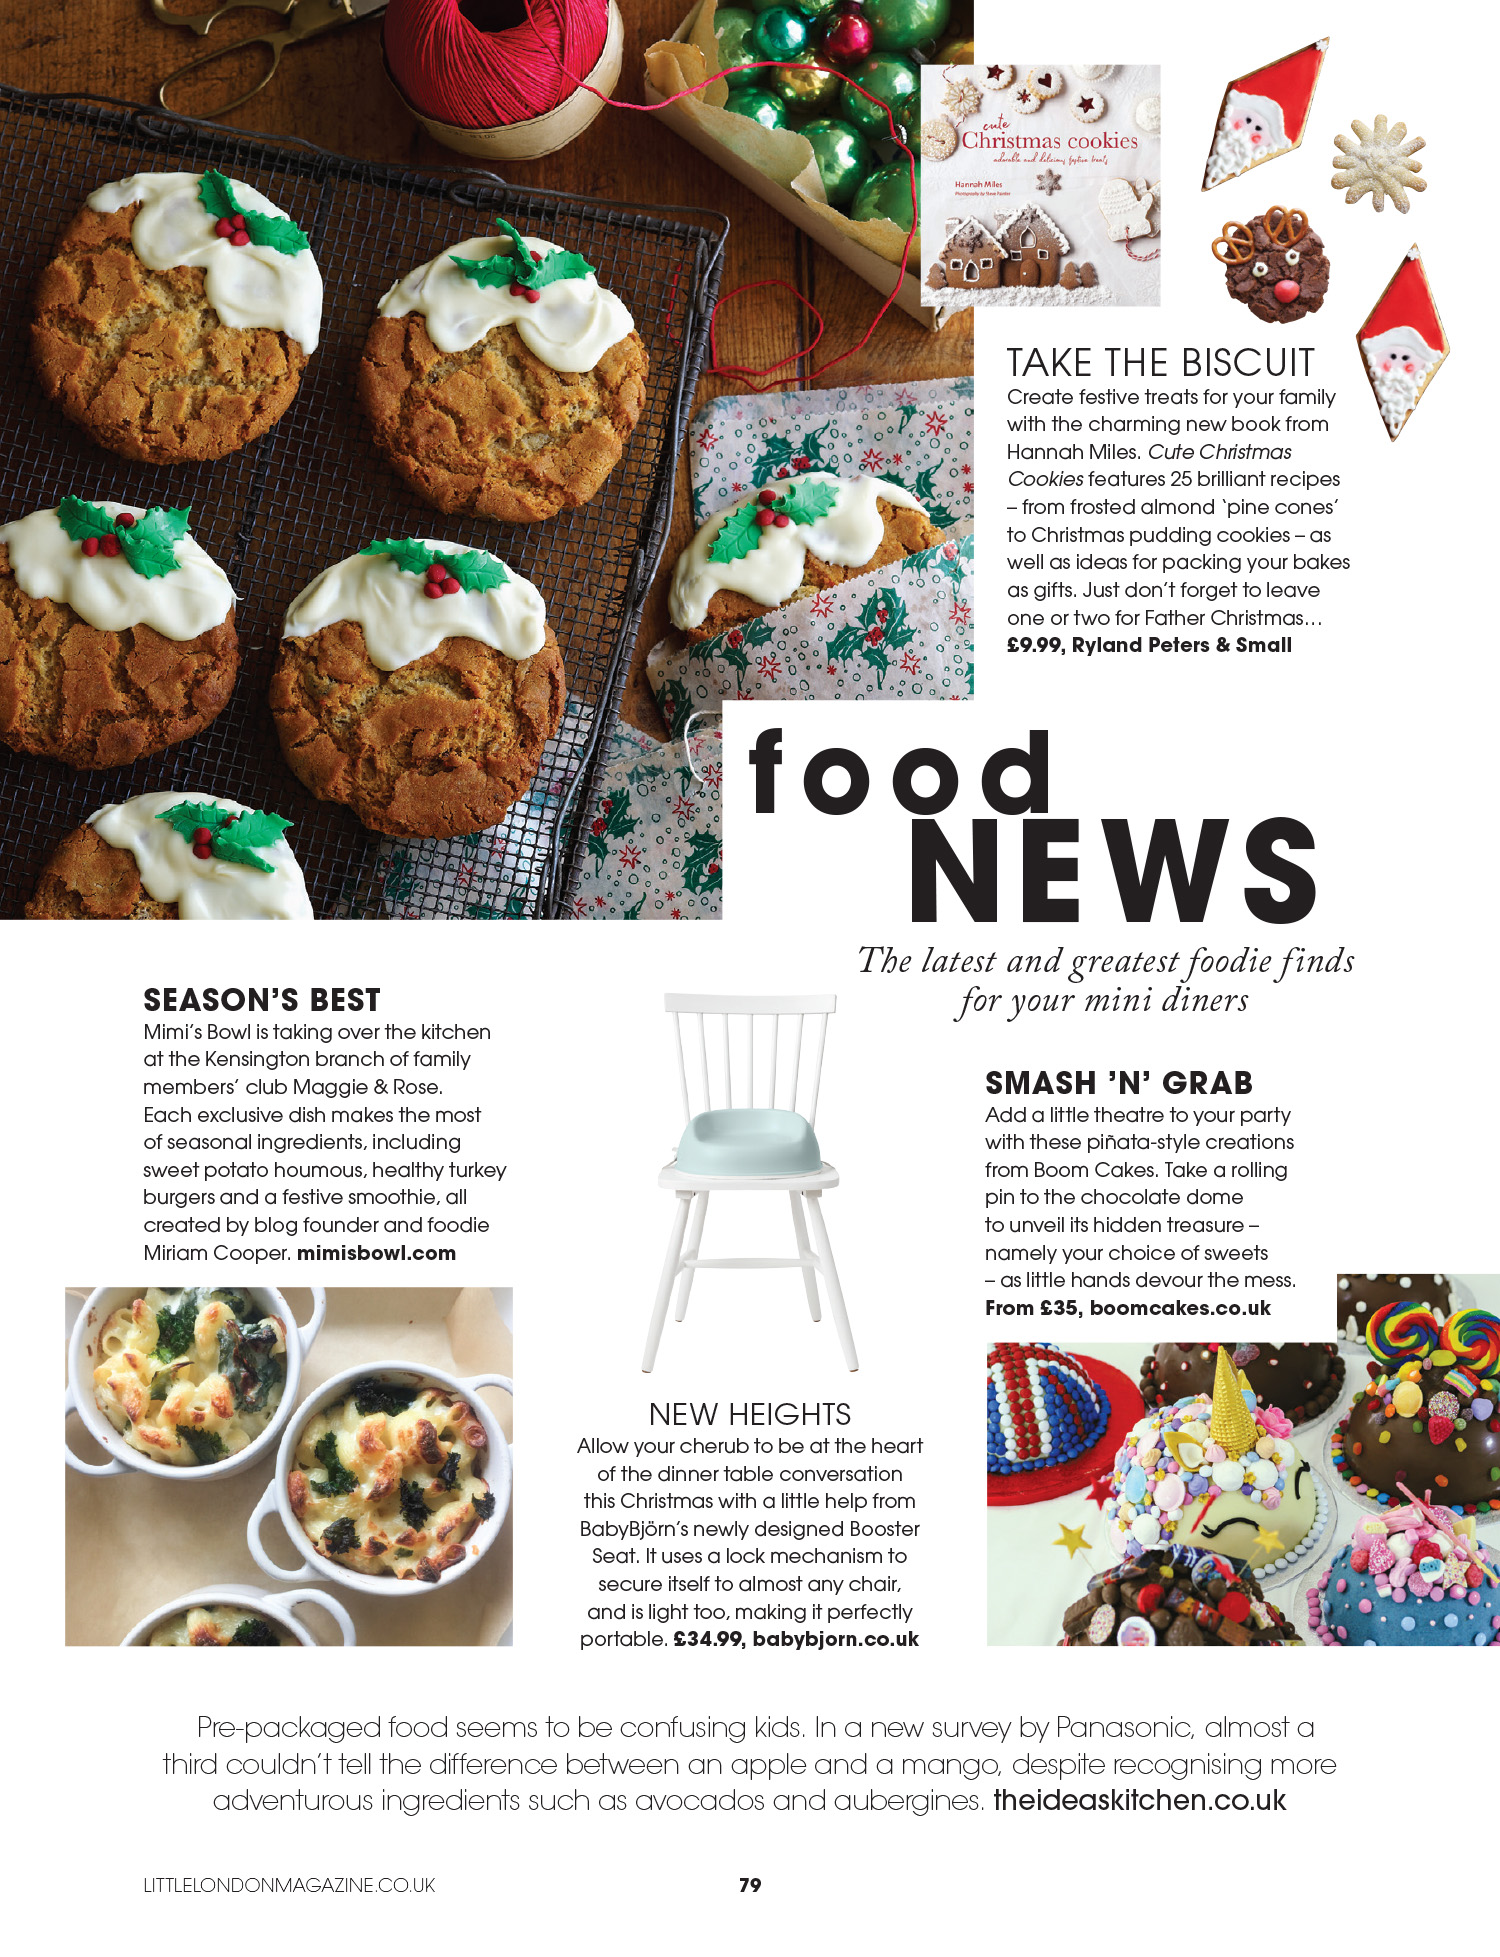 Little London DecJan - Food News.jpg